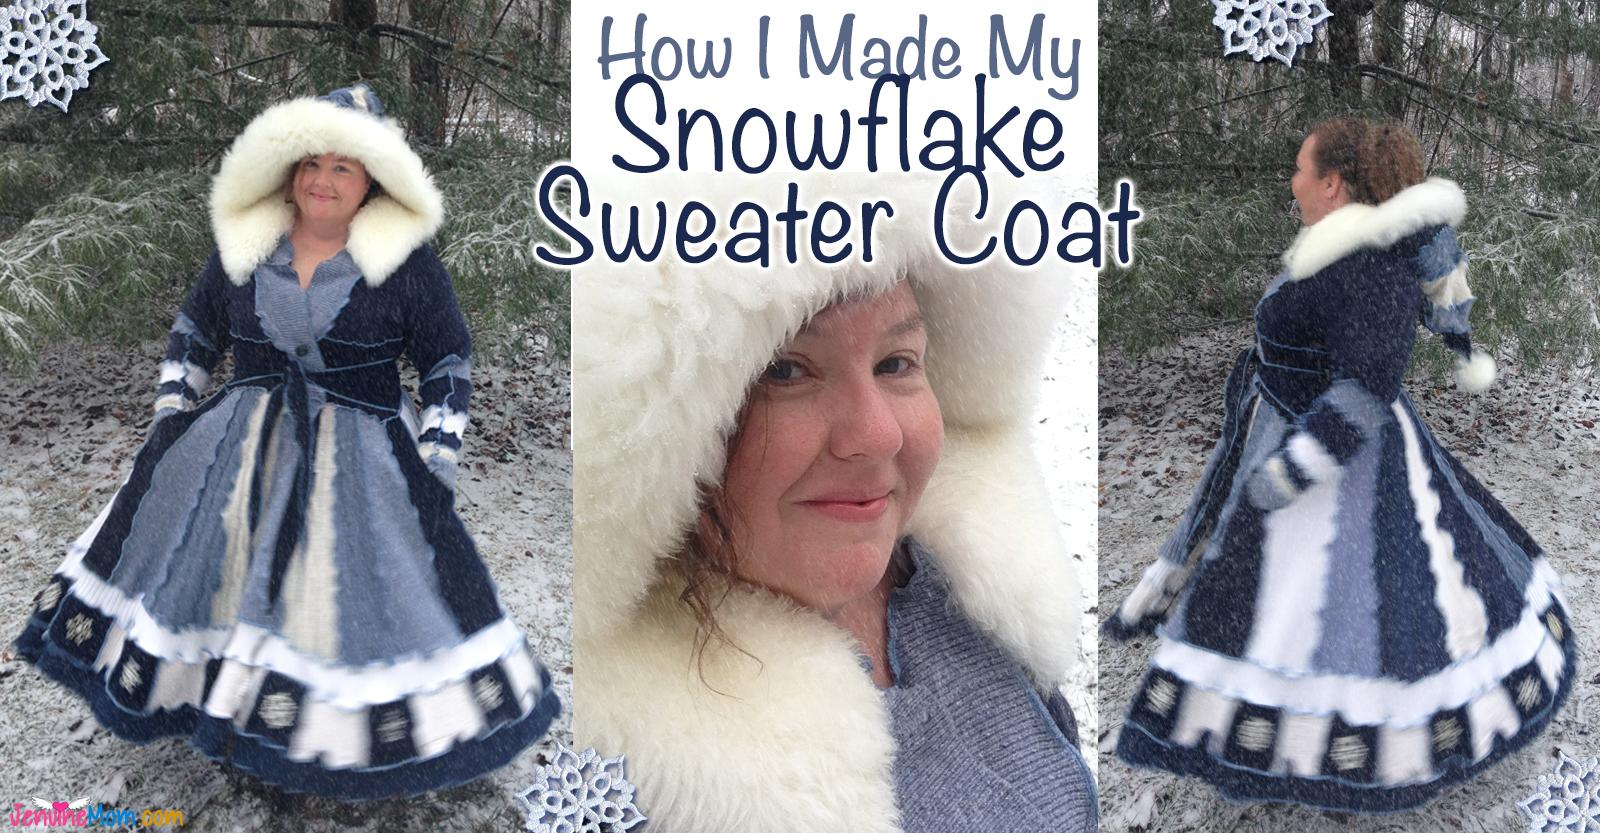 snowflake-sweater-coat-title2